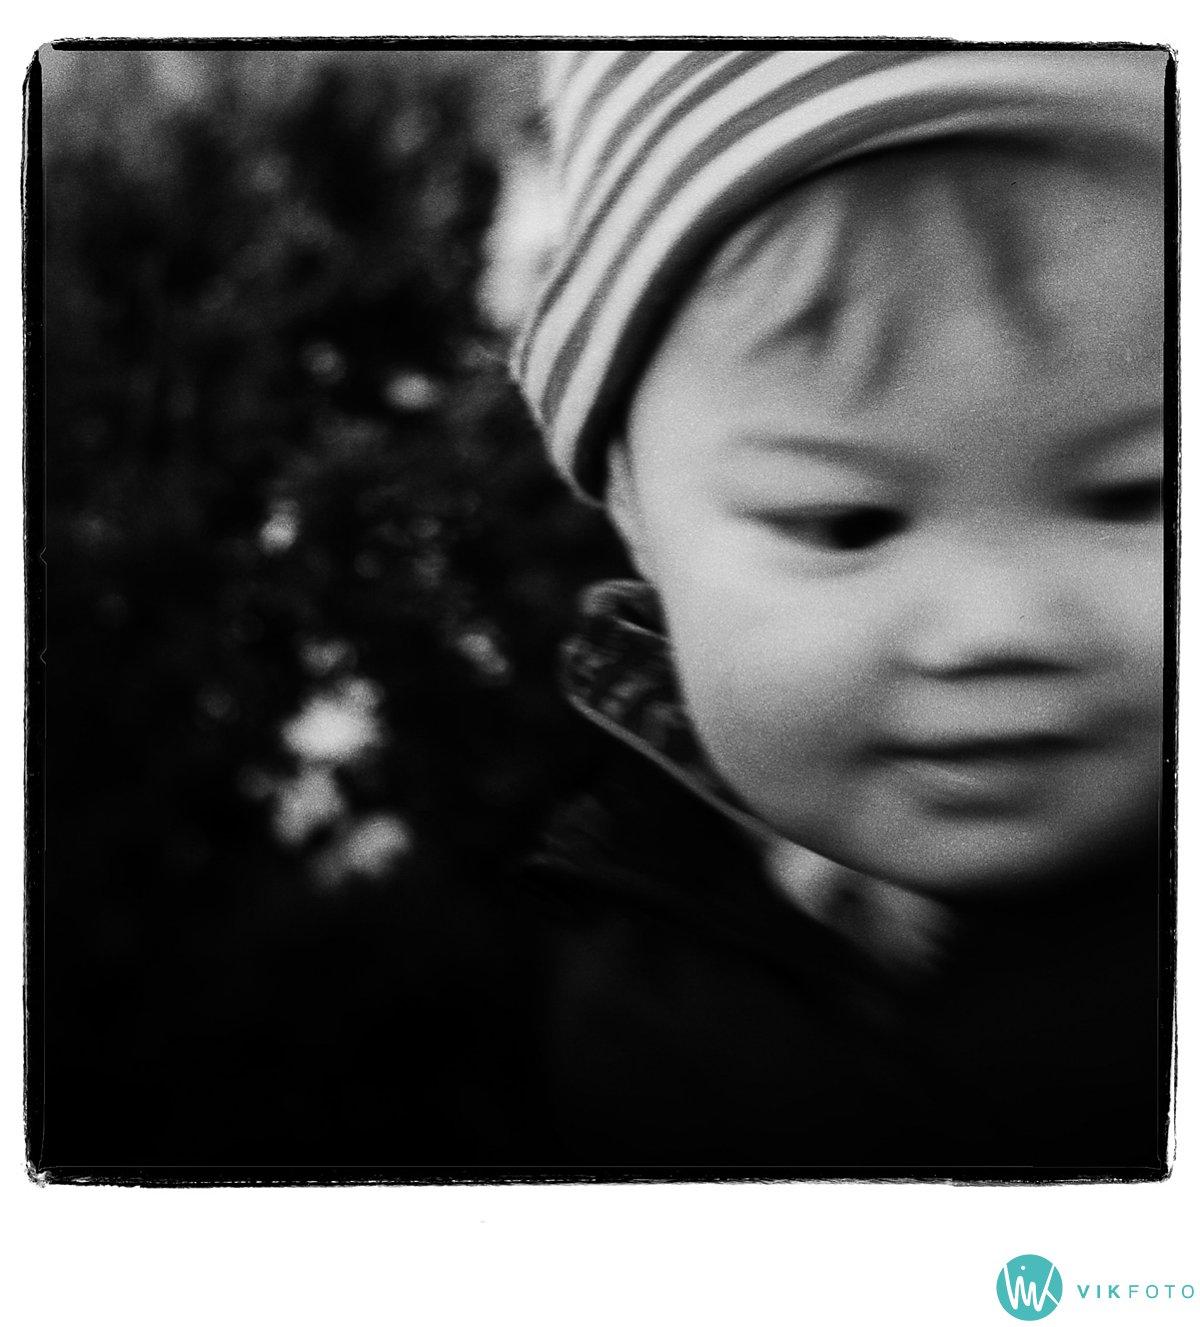 portrett-barn-lensbaby-fotograf.jpg